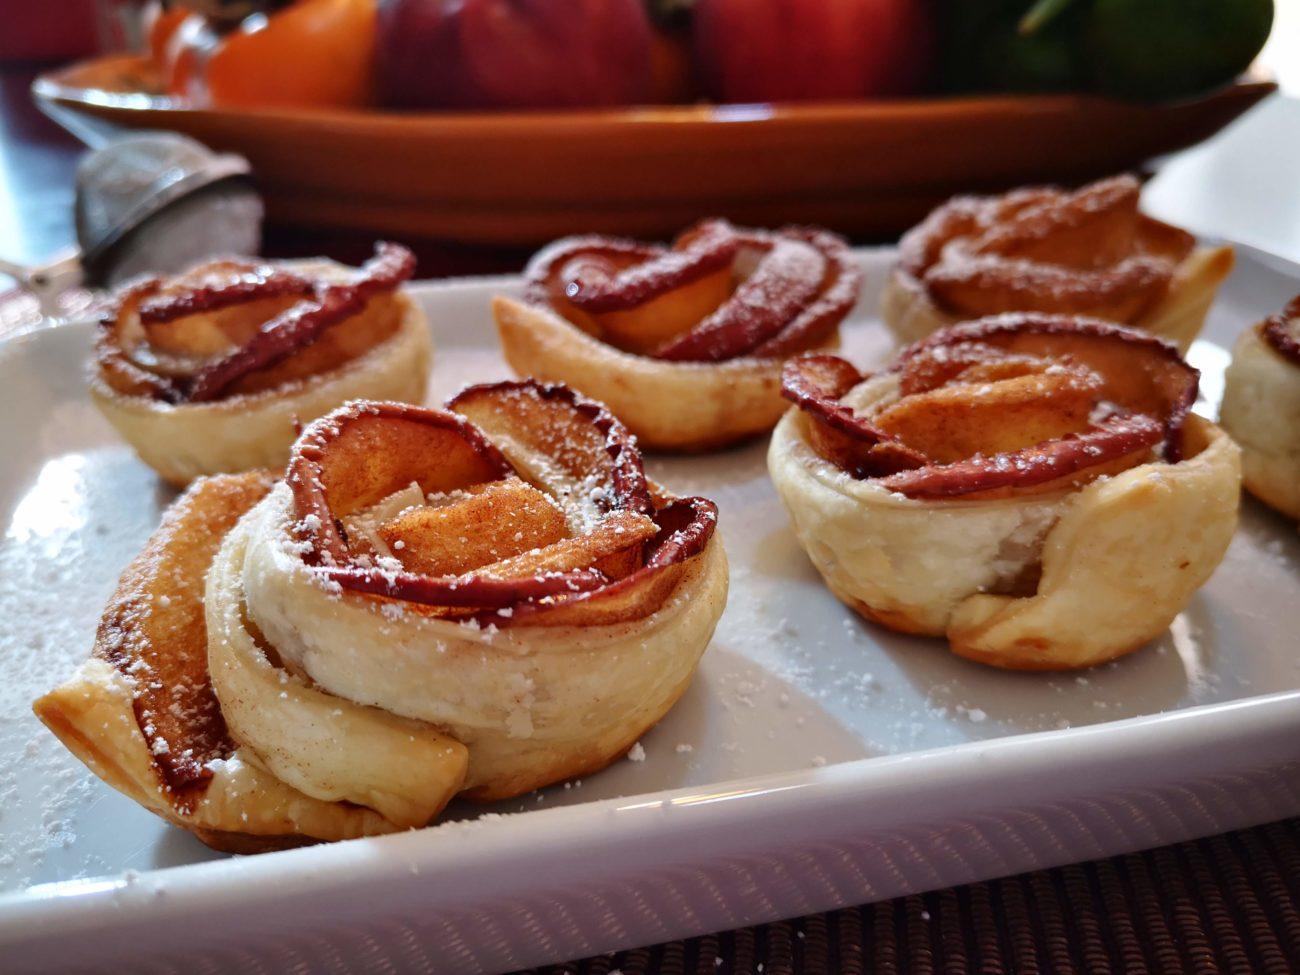 Roselline di mela: ricetta di Natale